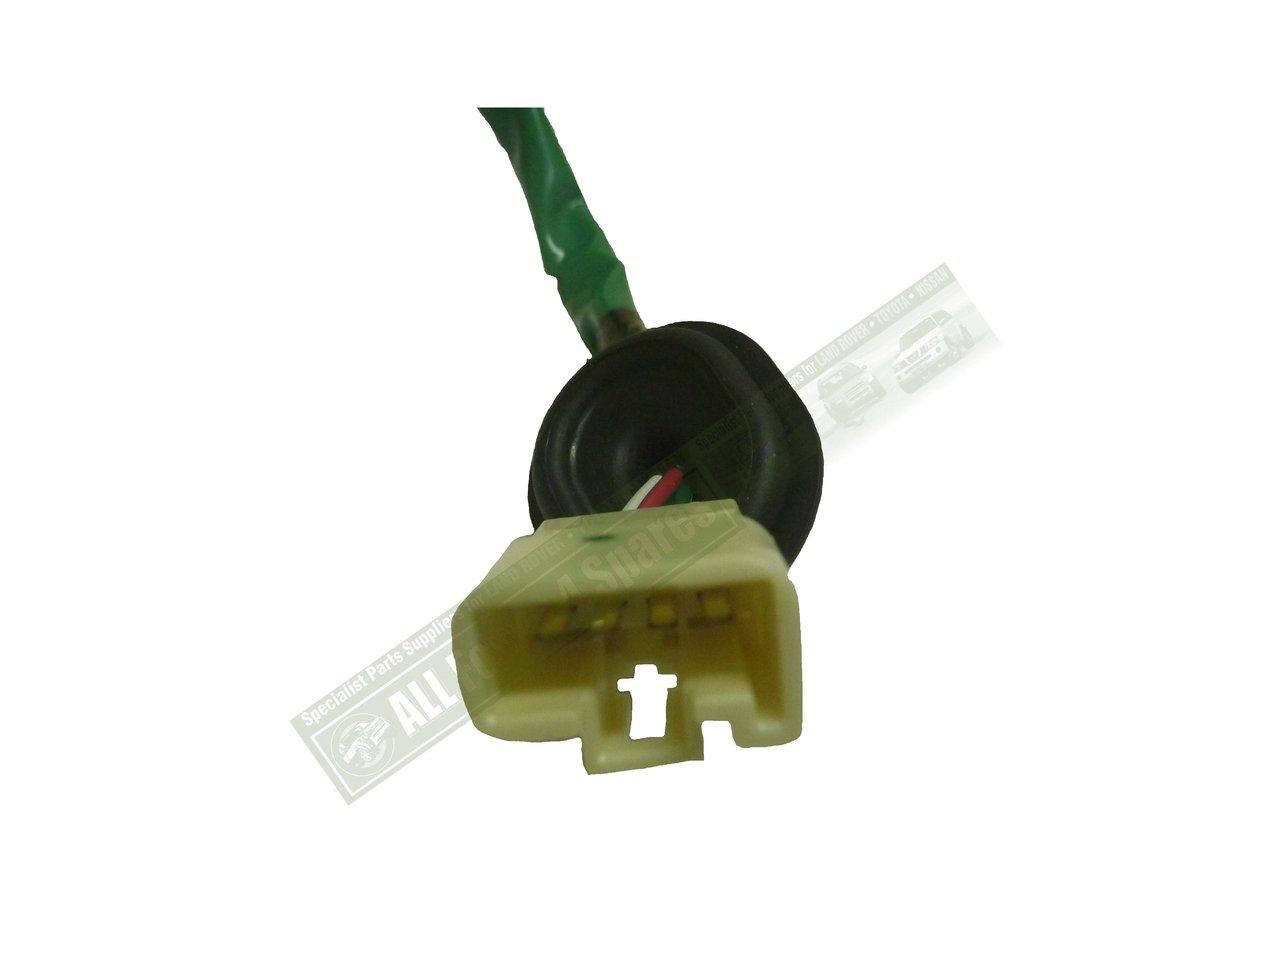 light wiring harness rhs landcruiser 81555 60790